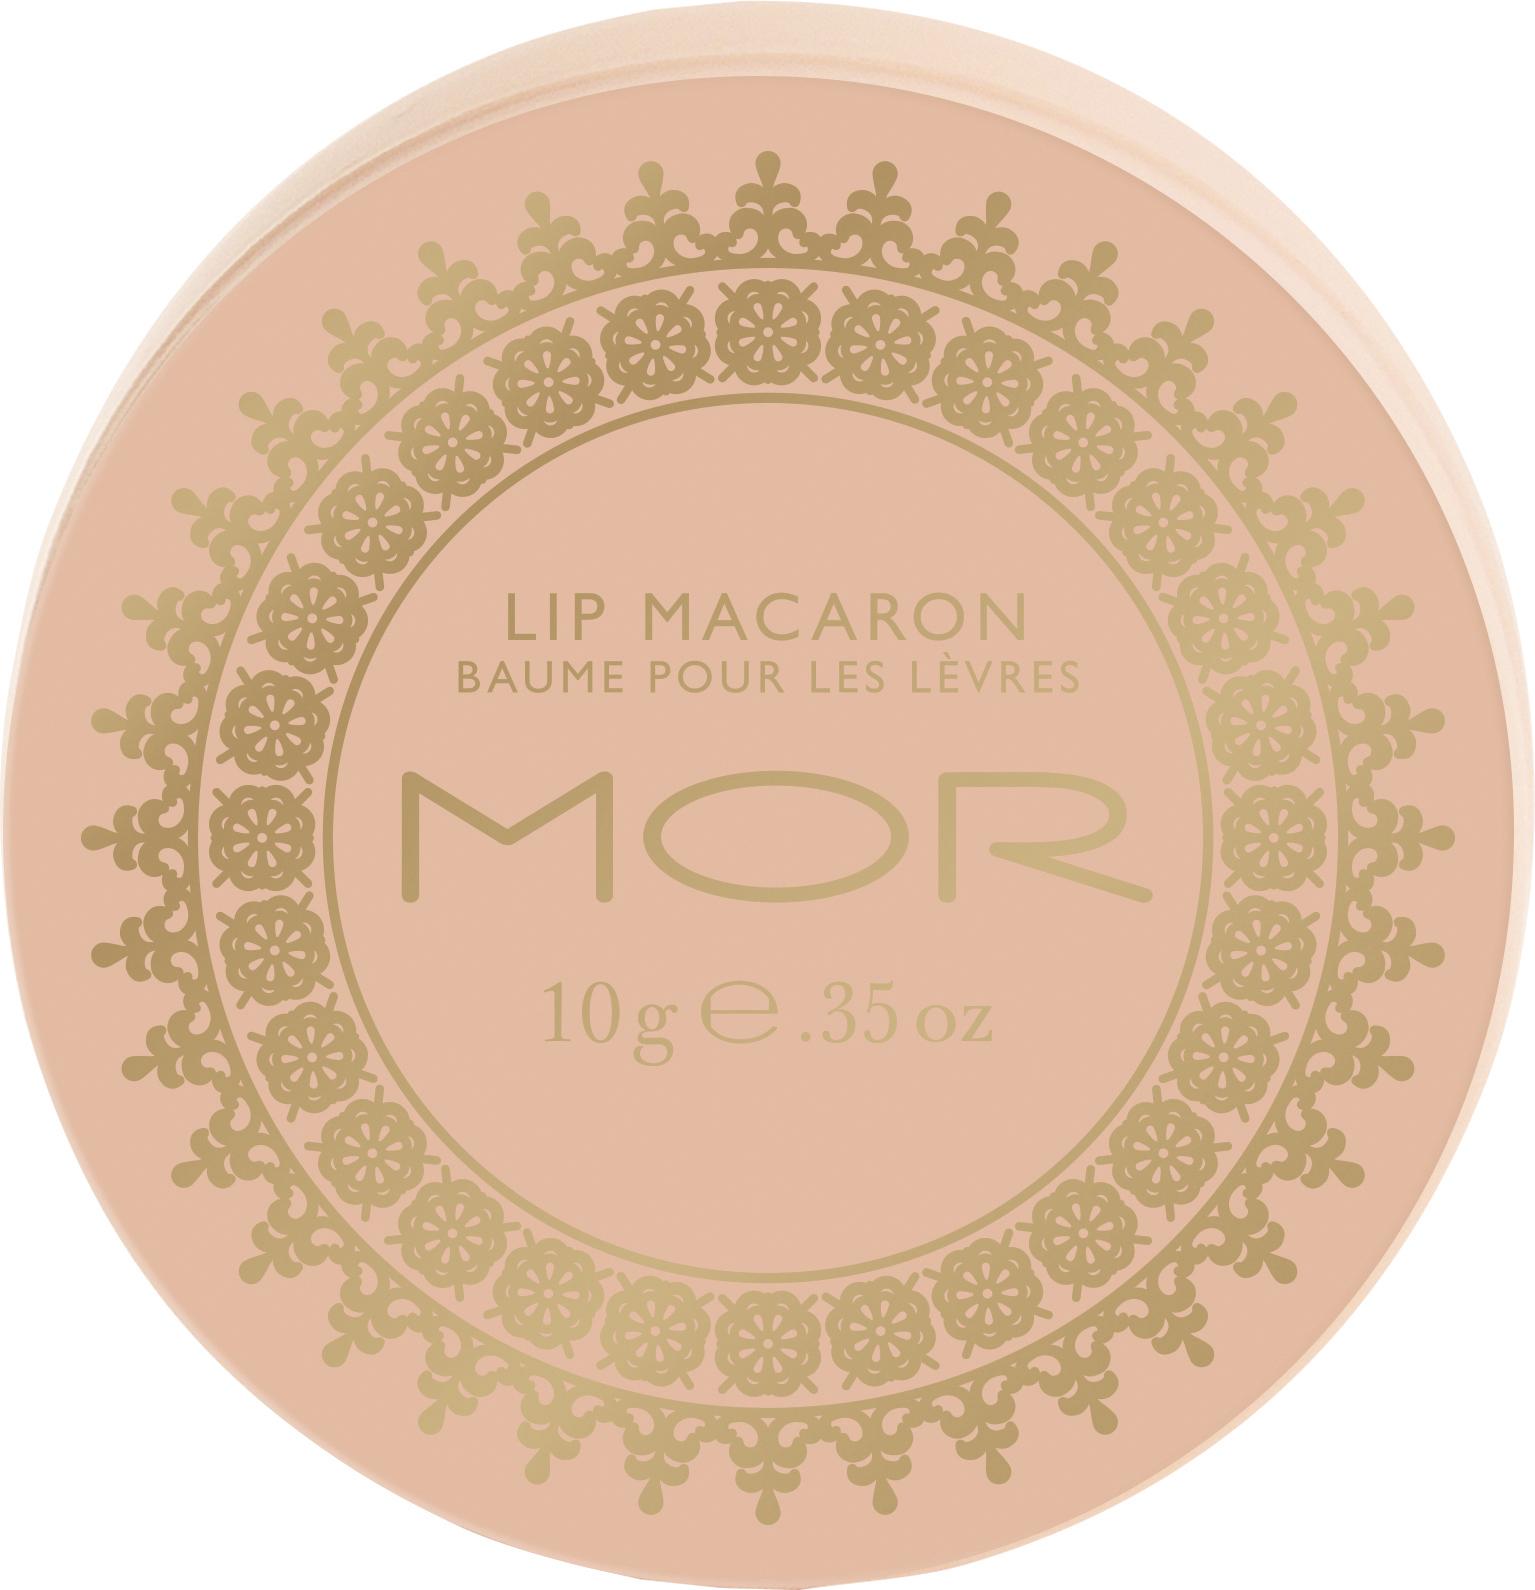 MOR Lip Macaron - Peach Nectar (10g) image